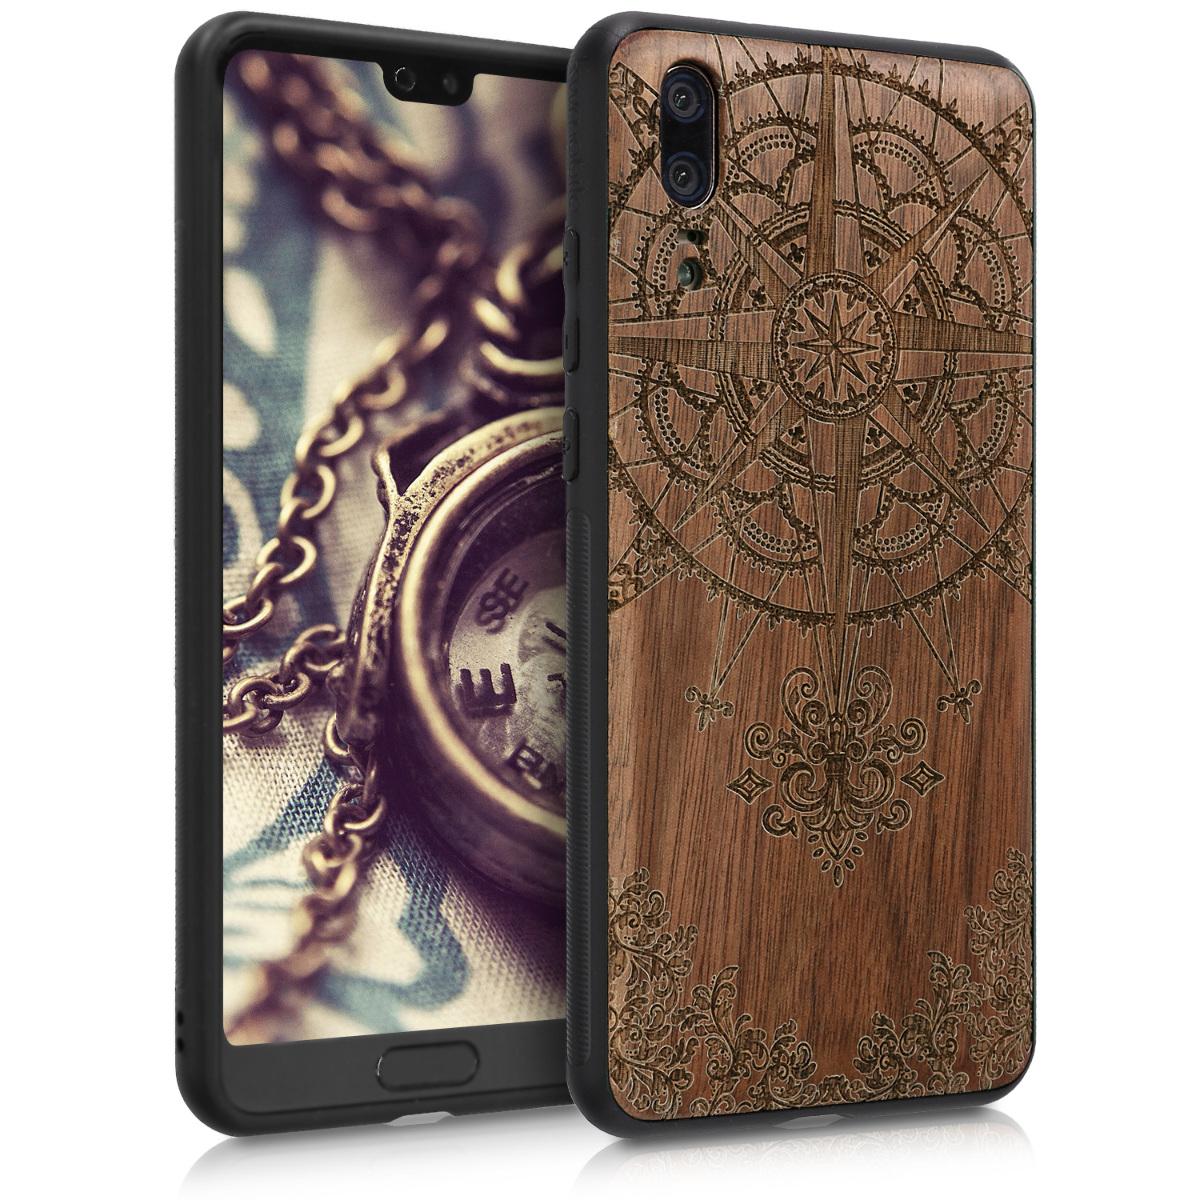 KW Ξύλινη Θήκη Huawei P20 -  Baroque Compass - (45989.01)